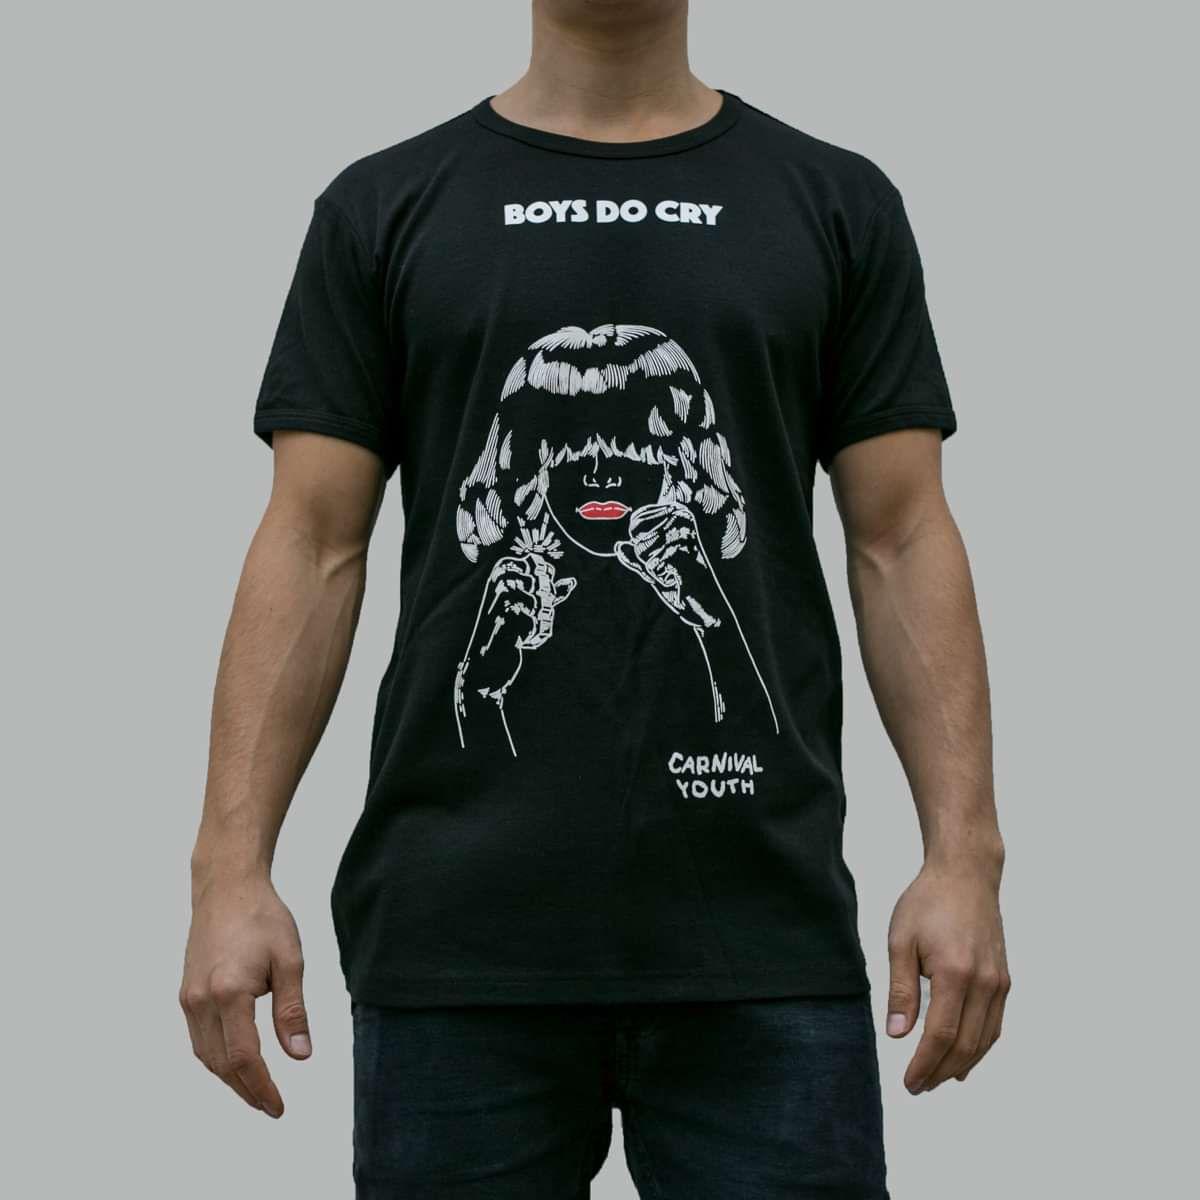 Boys Do Cry T-shirt - Carnival Youth